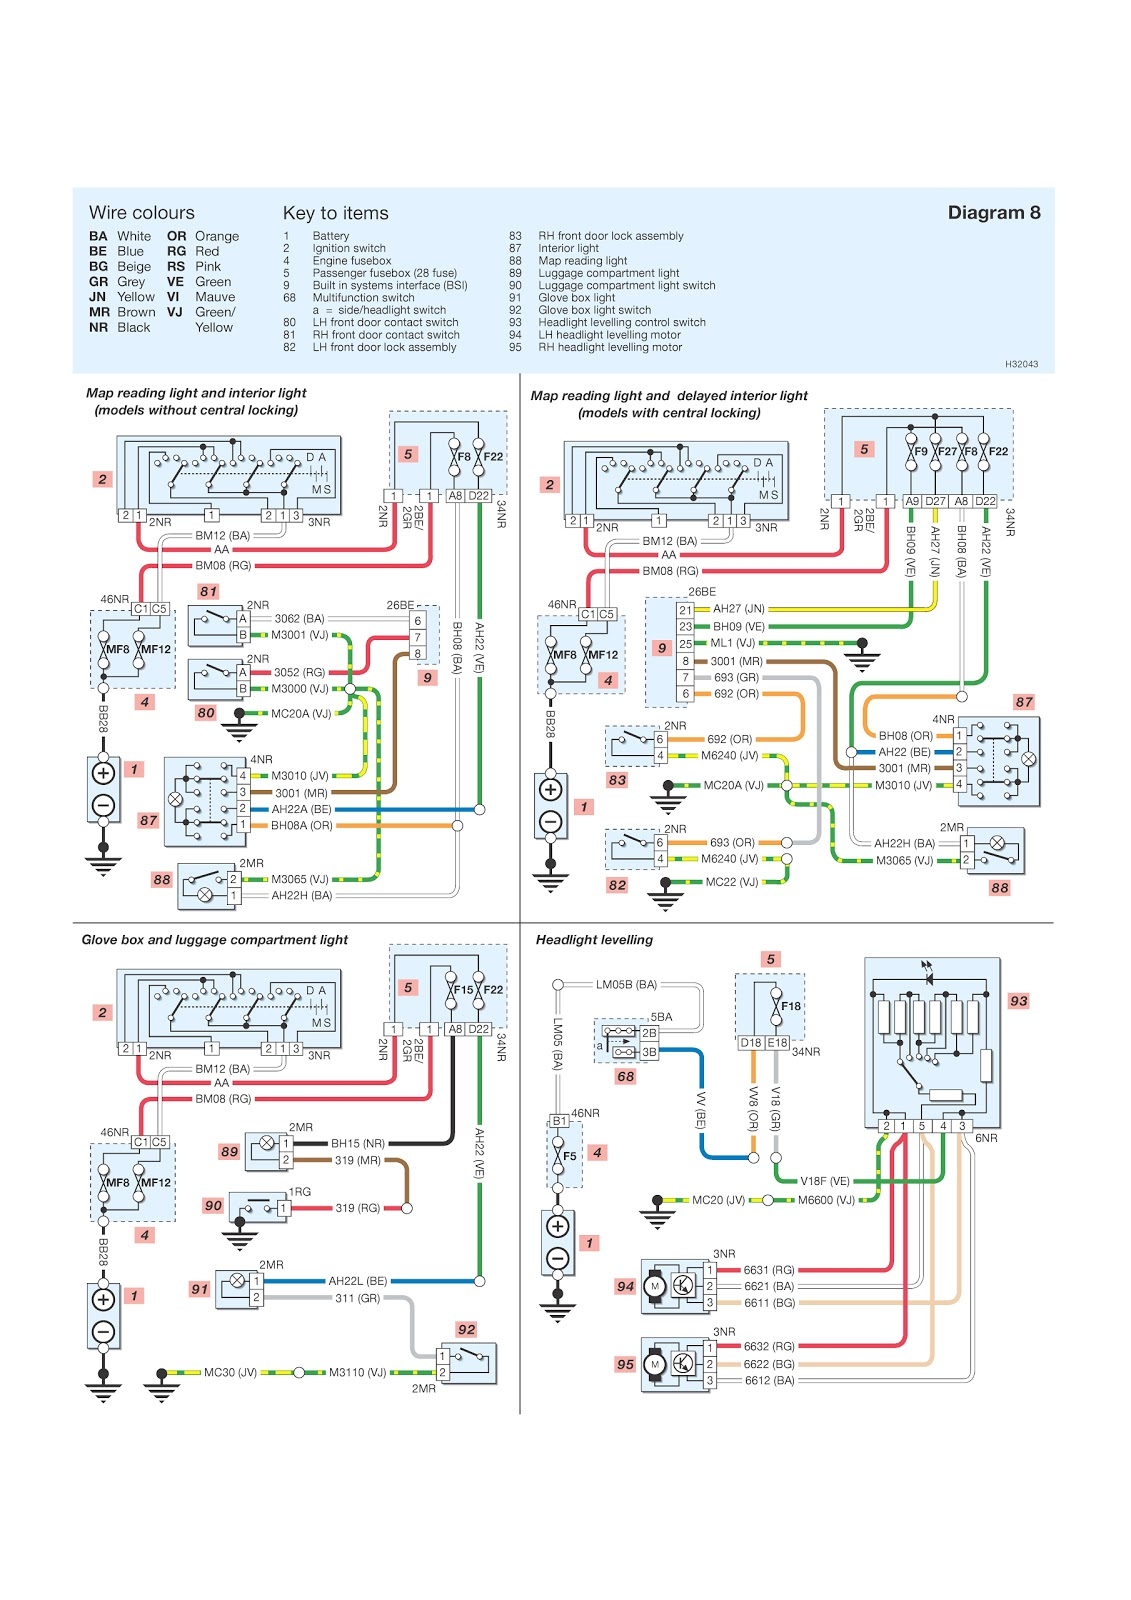 peugeot lights wiring diagram ueosed thedelhipalace de \u2022 1979 Peugeot Moped peugeot 406 brake light wiring diagram wiring diagram rh 2 nucleusvr nl peugeot 308 rear light